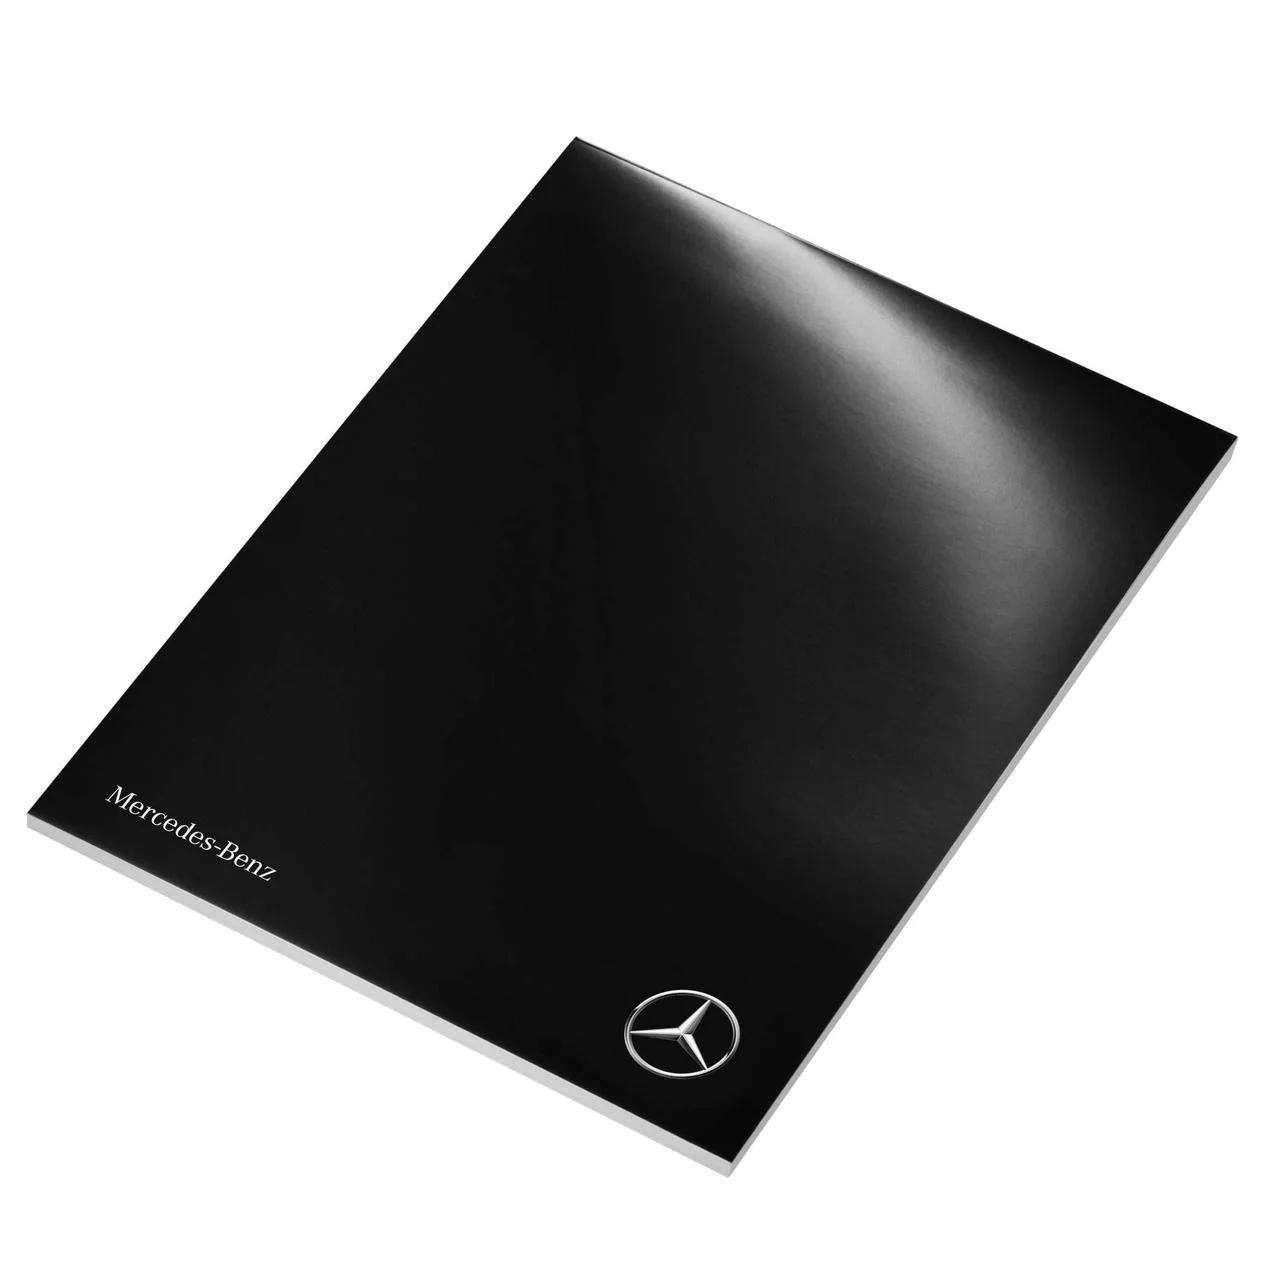 Блокнот Mercedes-Benz Writing Pad, Black / White, артикул B66958366